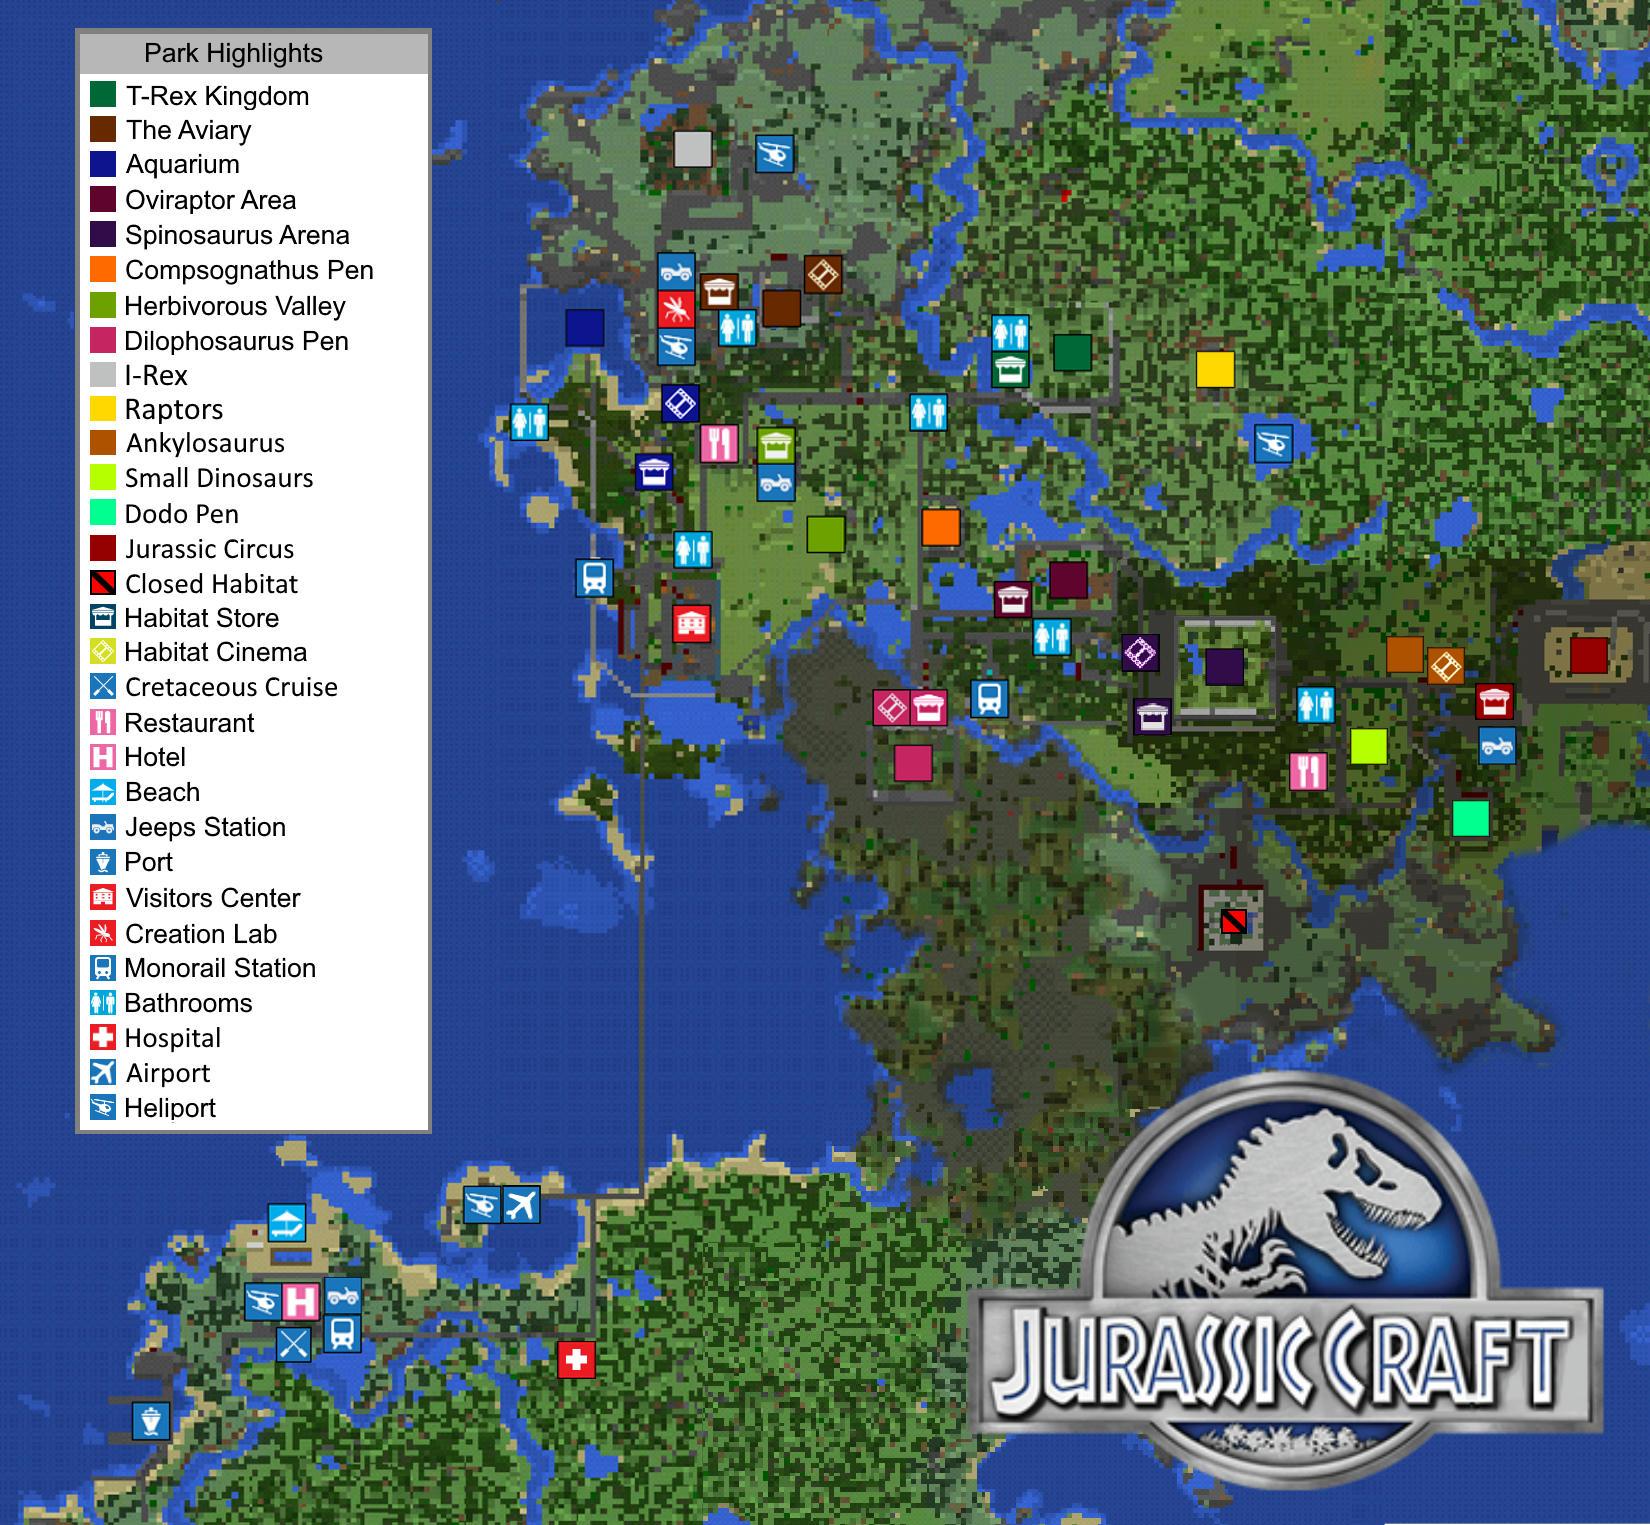 Jurassic Craft Add-On! Add Dinosaurs to your Minecraft PE